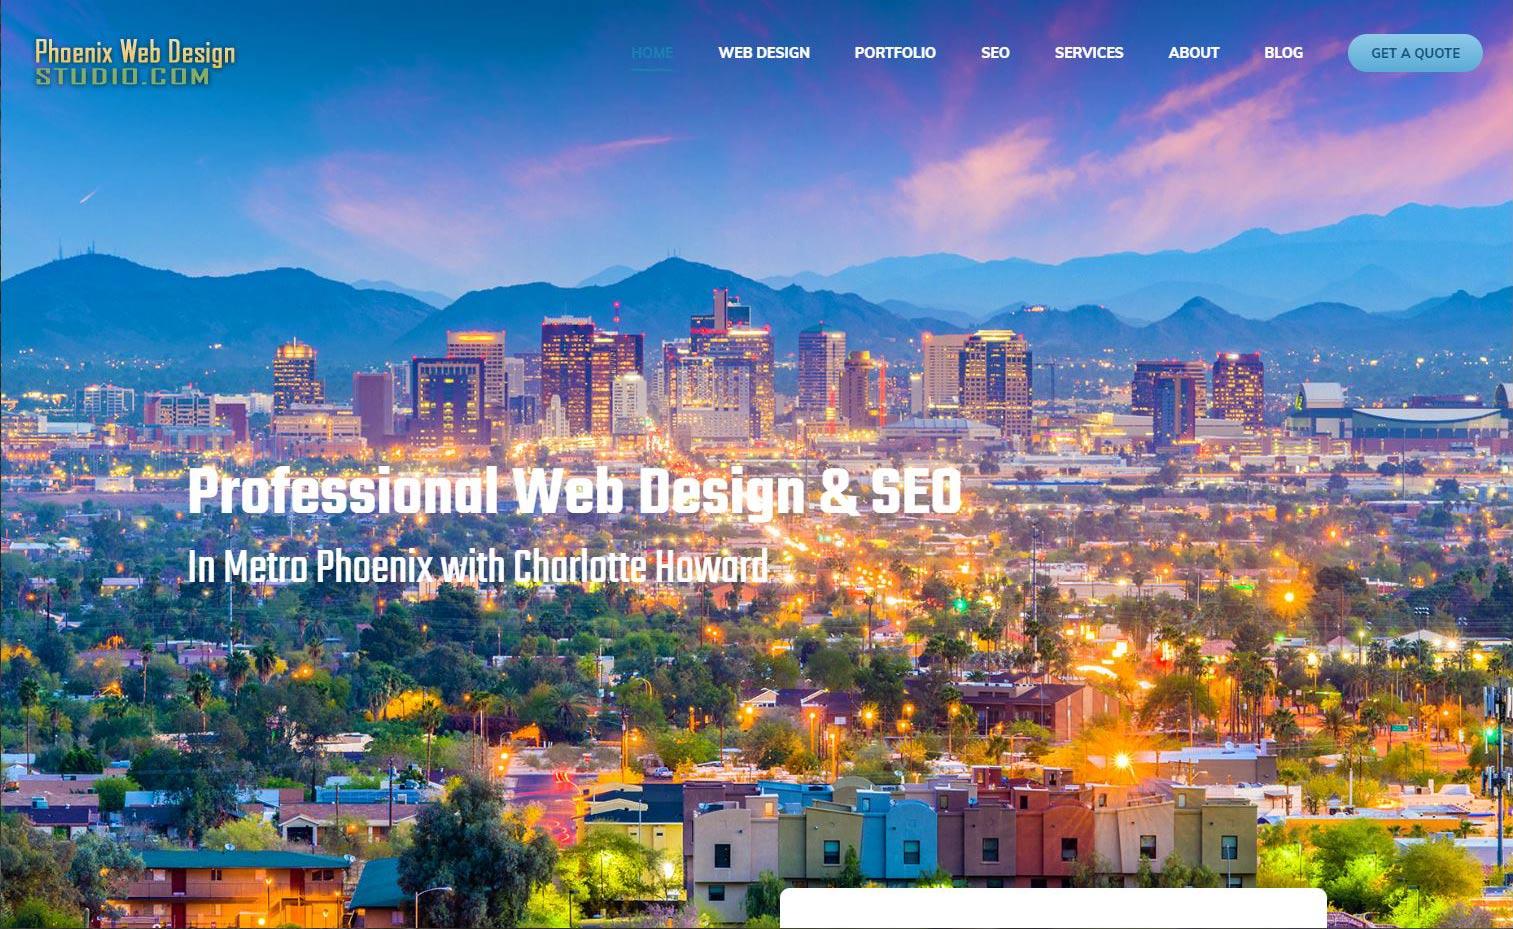 Phoenix and Scottsdale Area Web Design